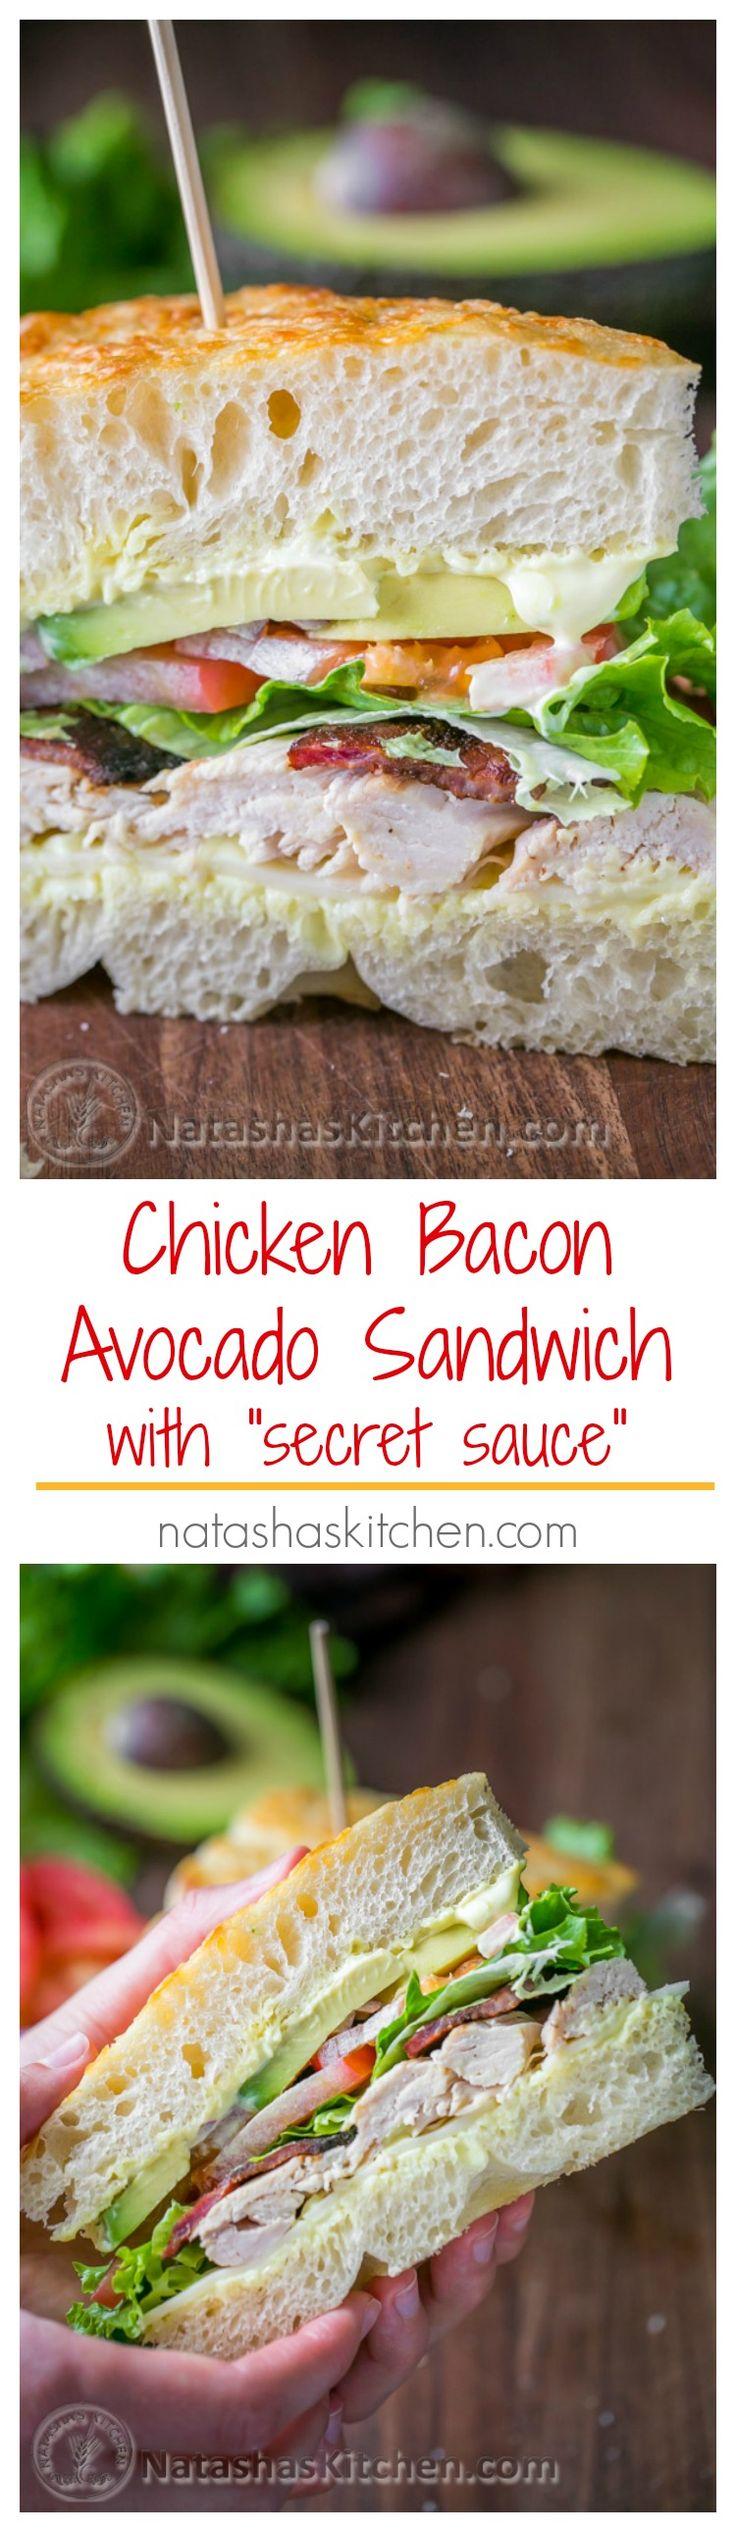 Chicken Bacon Avocado Sandwich with secret sauce - A Kneaders Bakery Copycat Recipe | https://NatashasKitchen.com